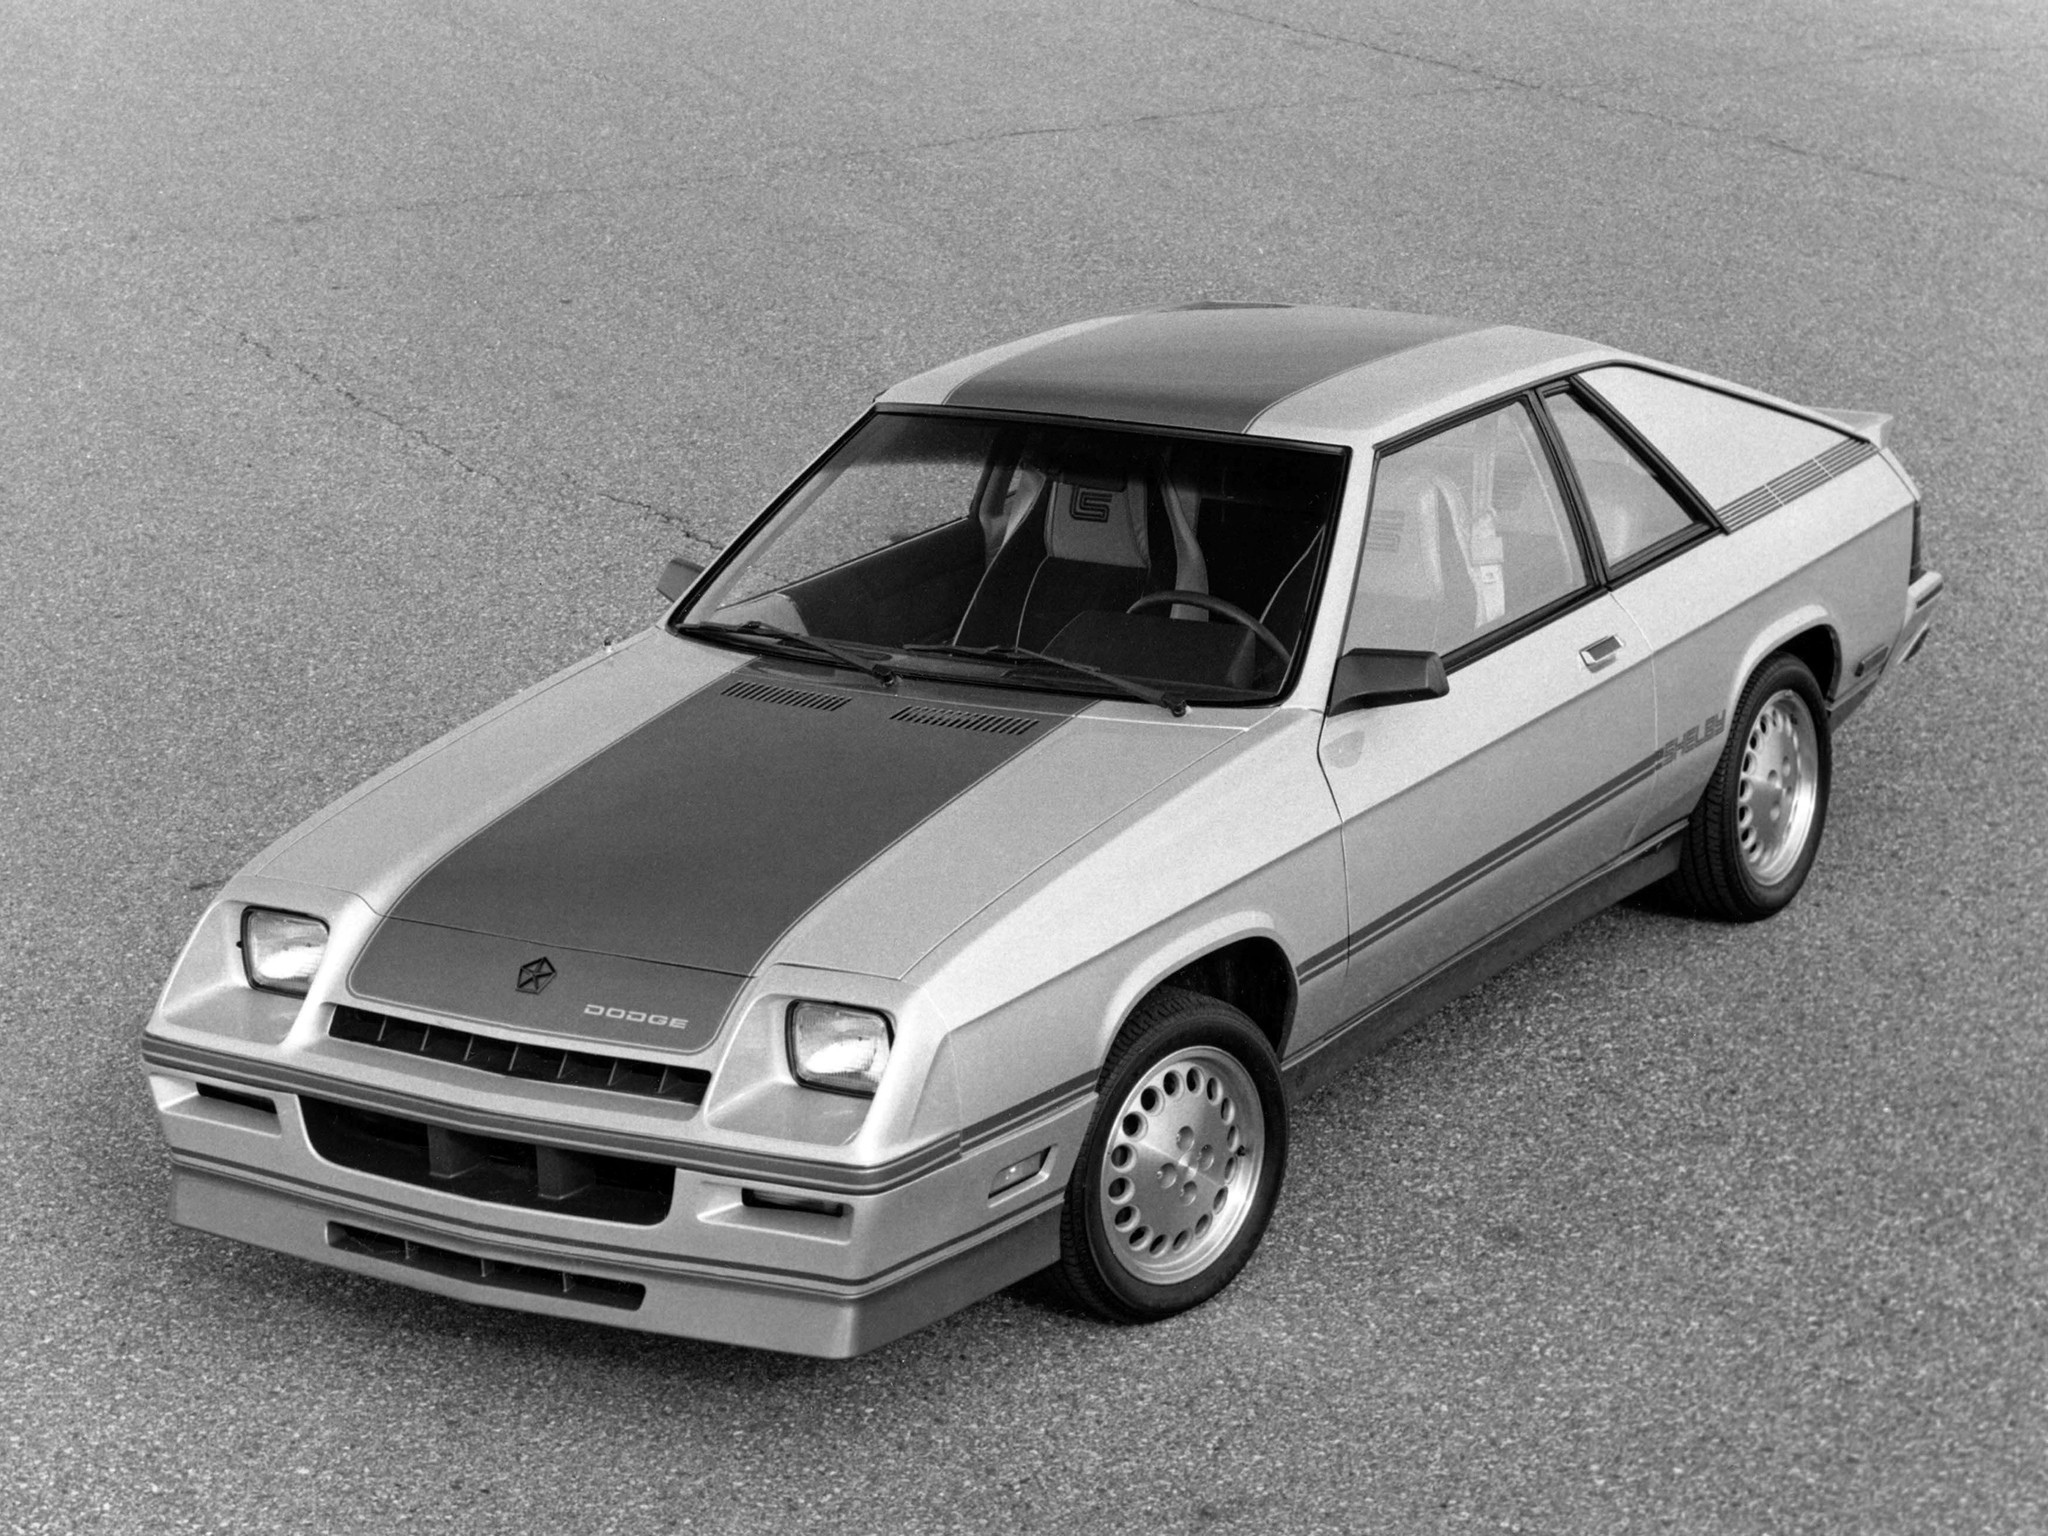 Dodge Charger Specs Amp Photos 1981 1982 1983 1984